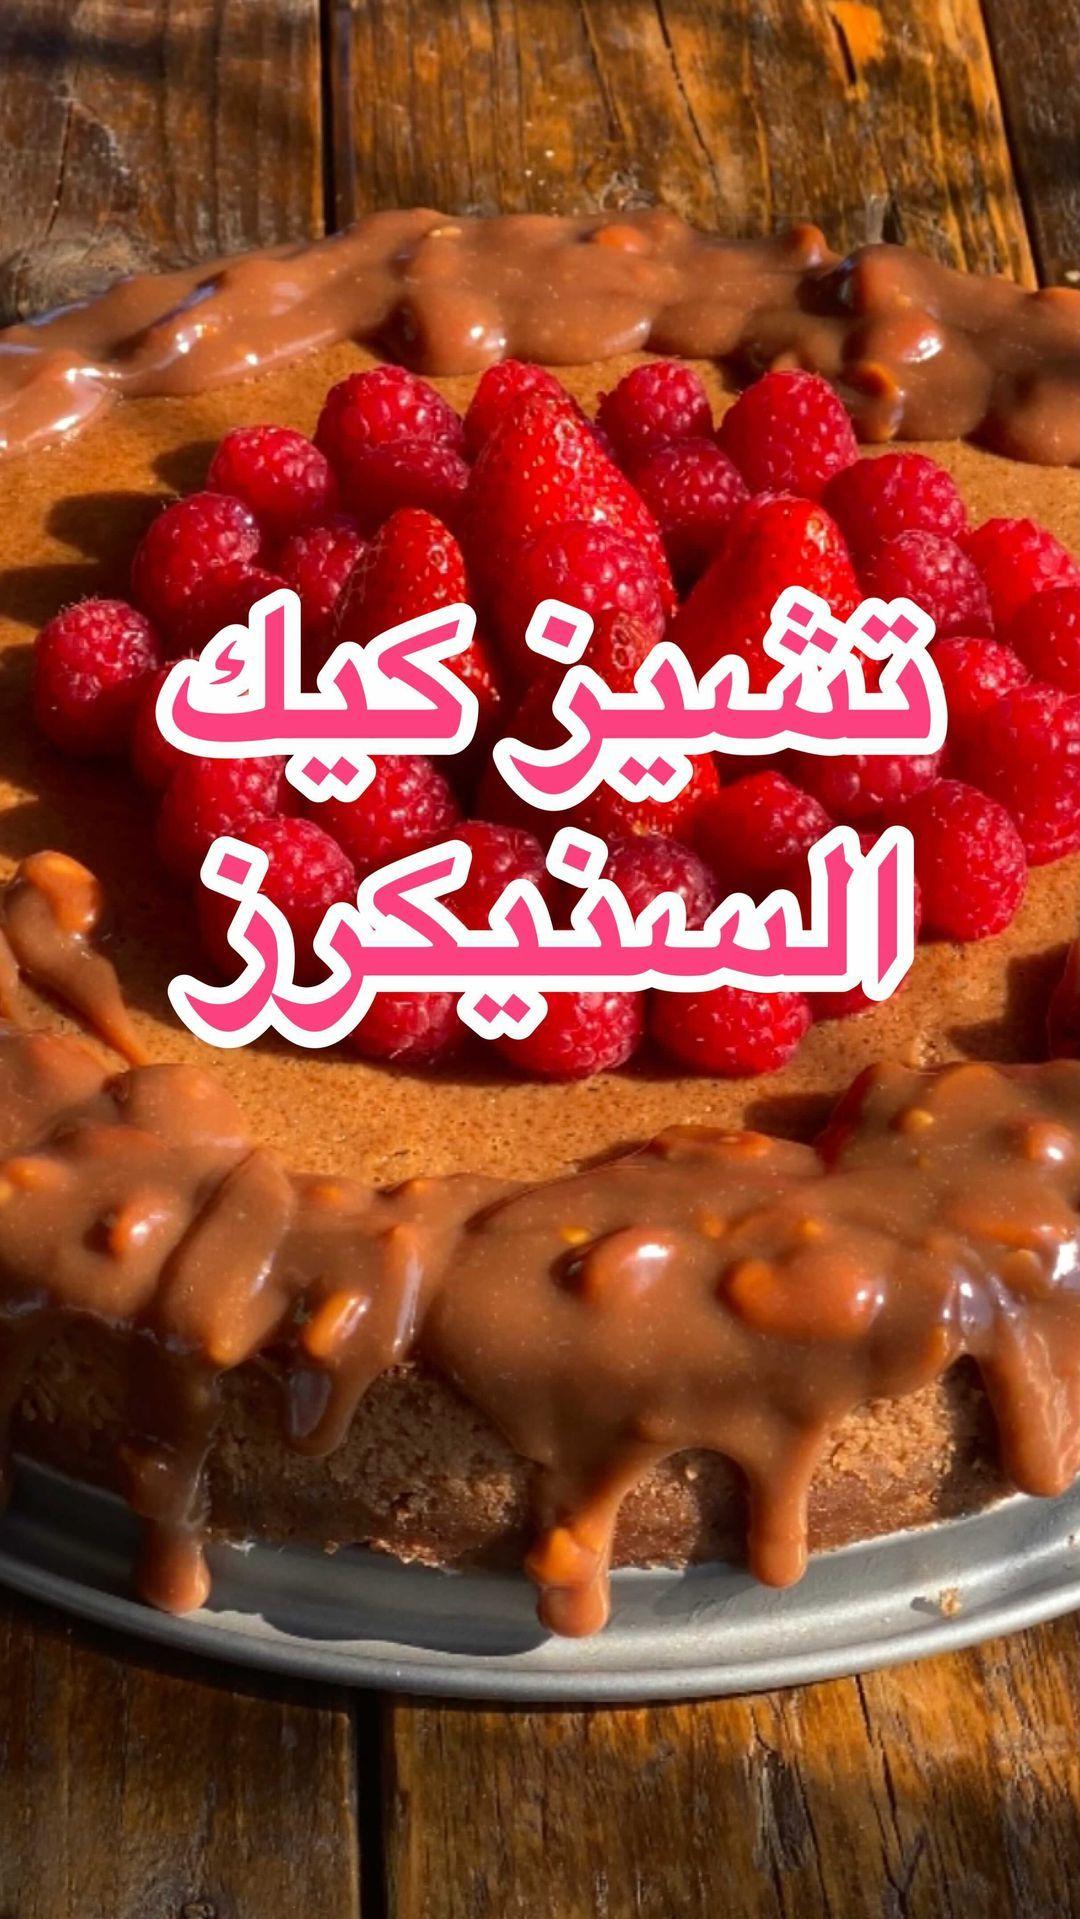 Nour Alhajj نور الحاج On Instagram ت ج ر ب وبقو ة المقادير ٣ الواح سنيكرز الواحد ٨٠غ ربع كوب كريمة خفق In 2021 Dessert Recipes Desserts Recipes